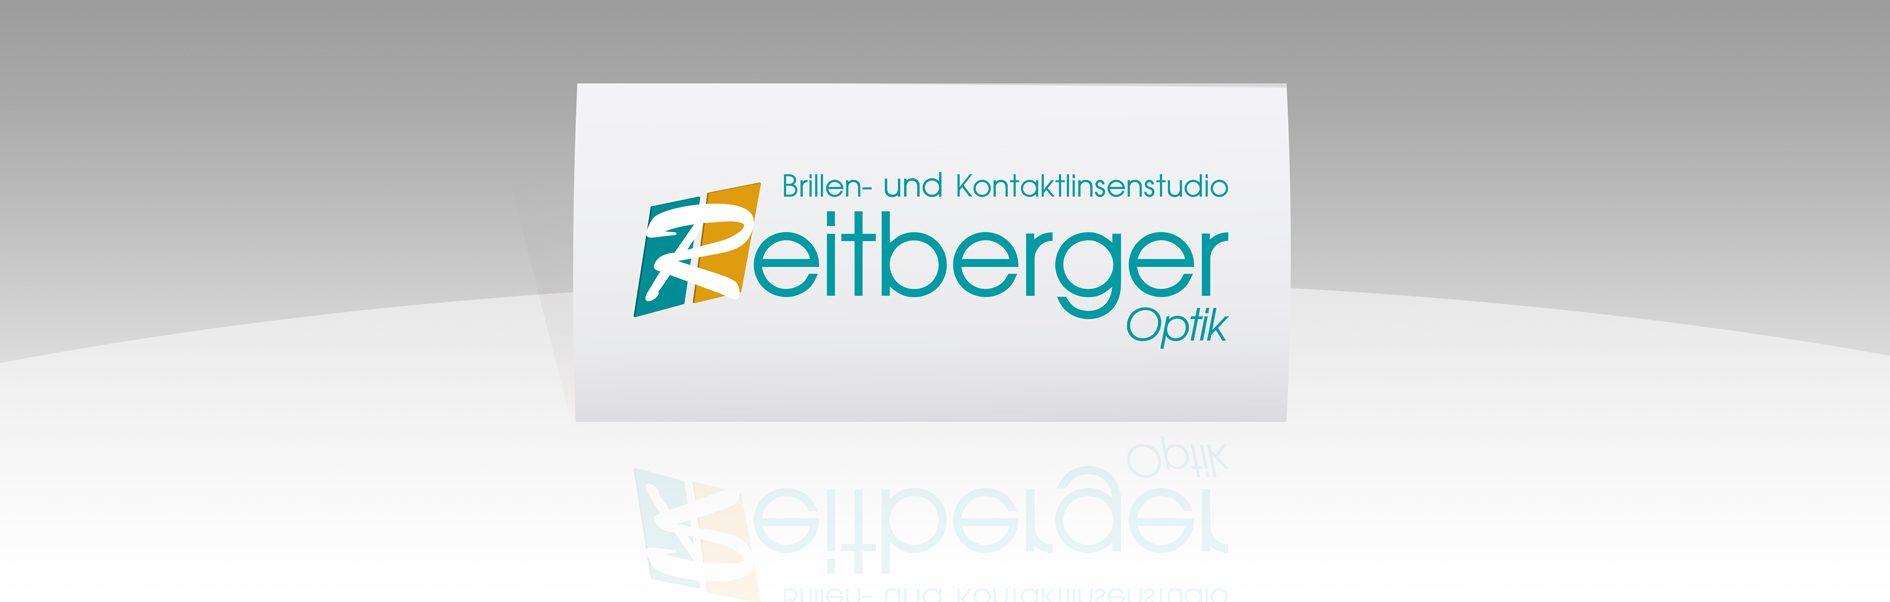 Hier ist das Reitberger Optik Logo abgebildet.